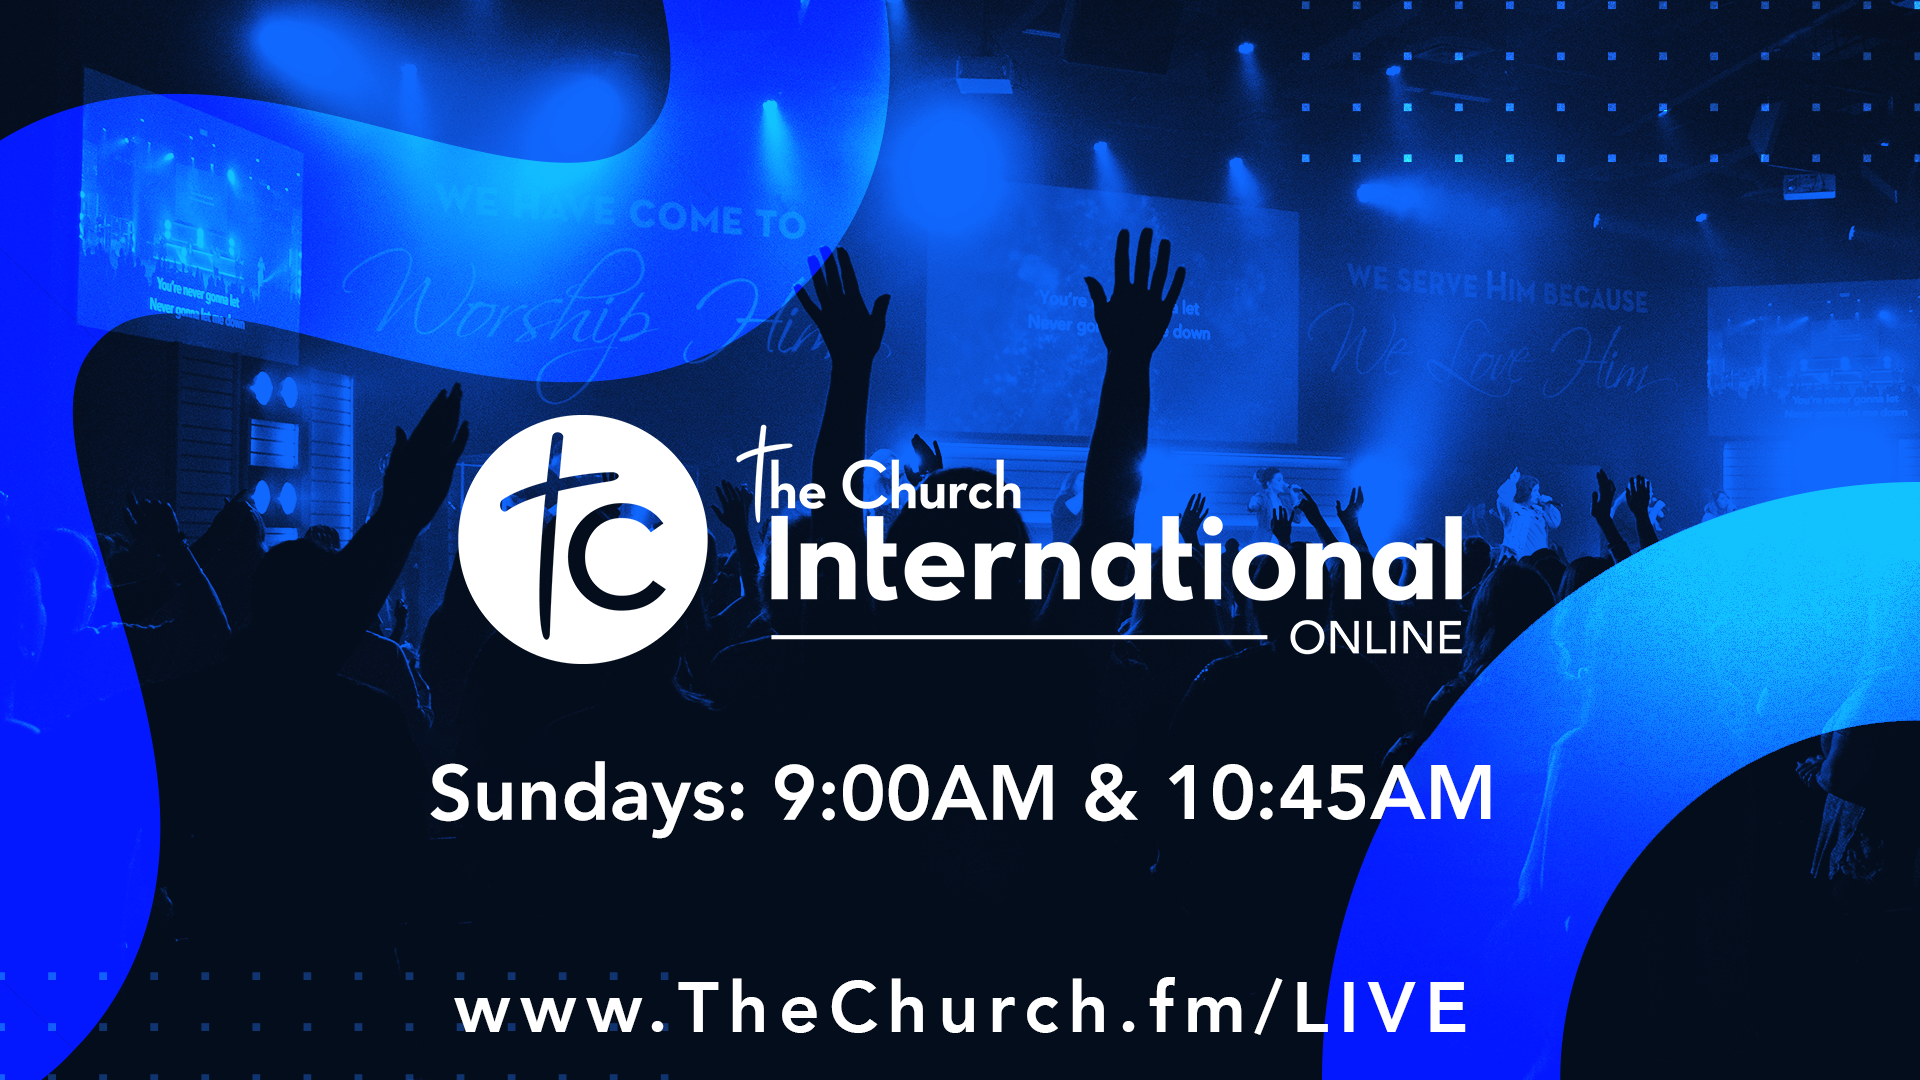 The Church Online. Sundays at 9am & 10:45am